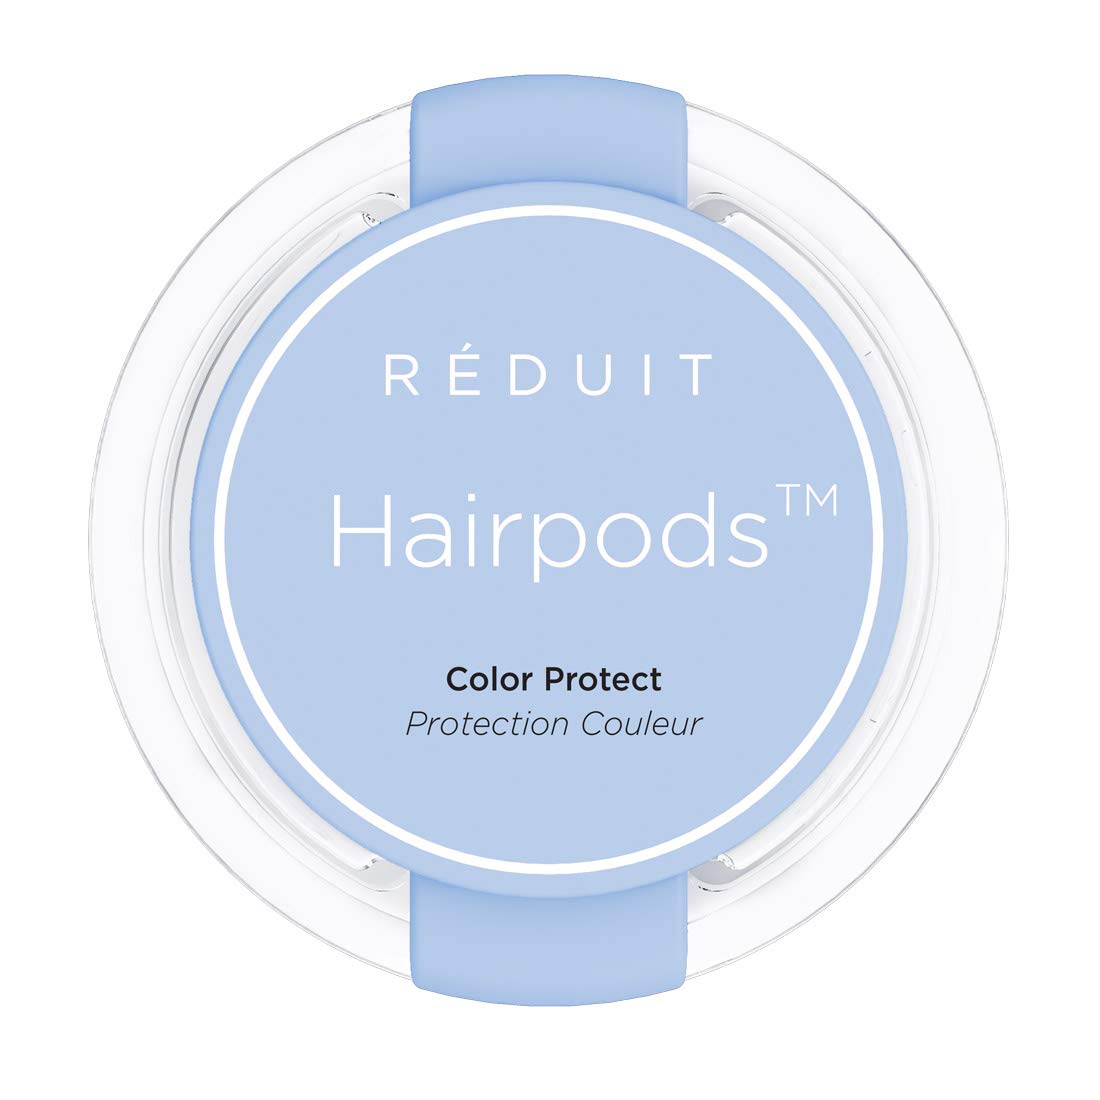 Surprise price RÉDUIT Hairpods Color Protect Hair cheap Colored Ha Care Treatment for